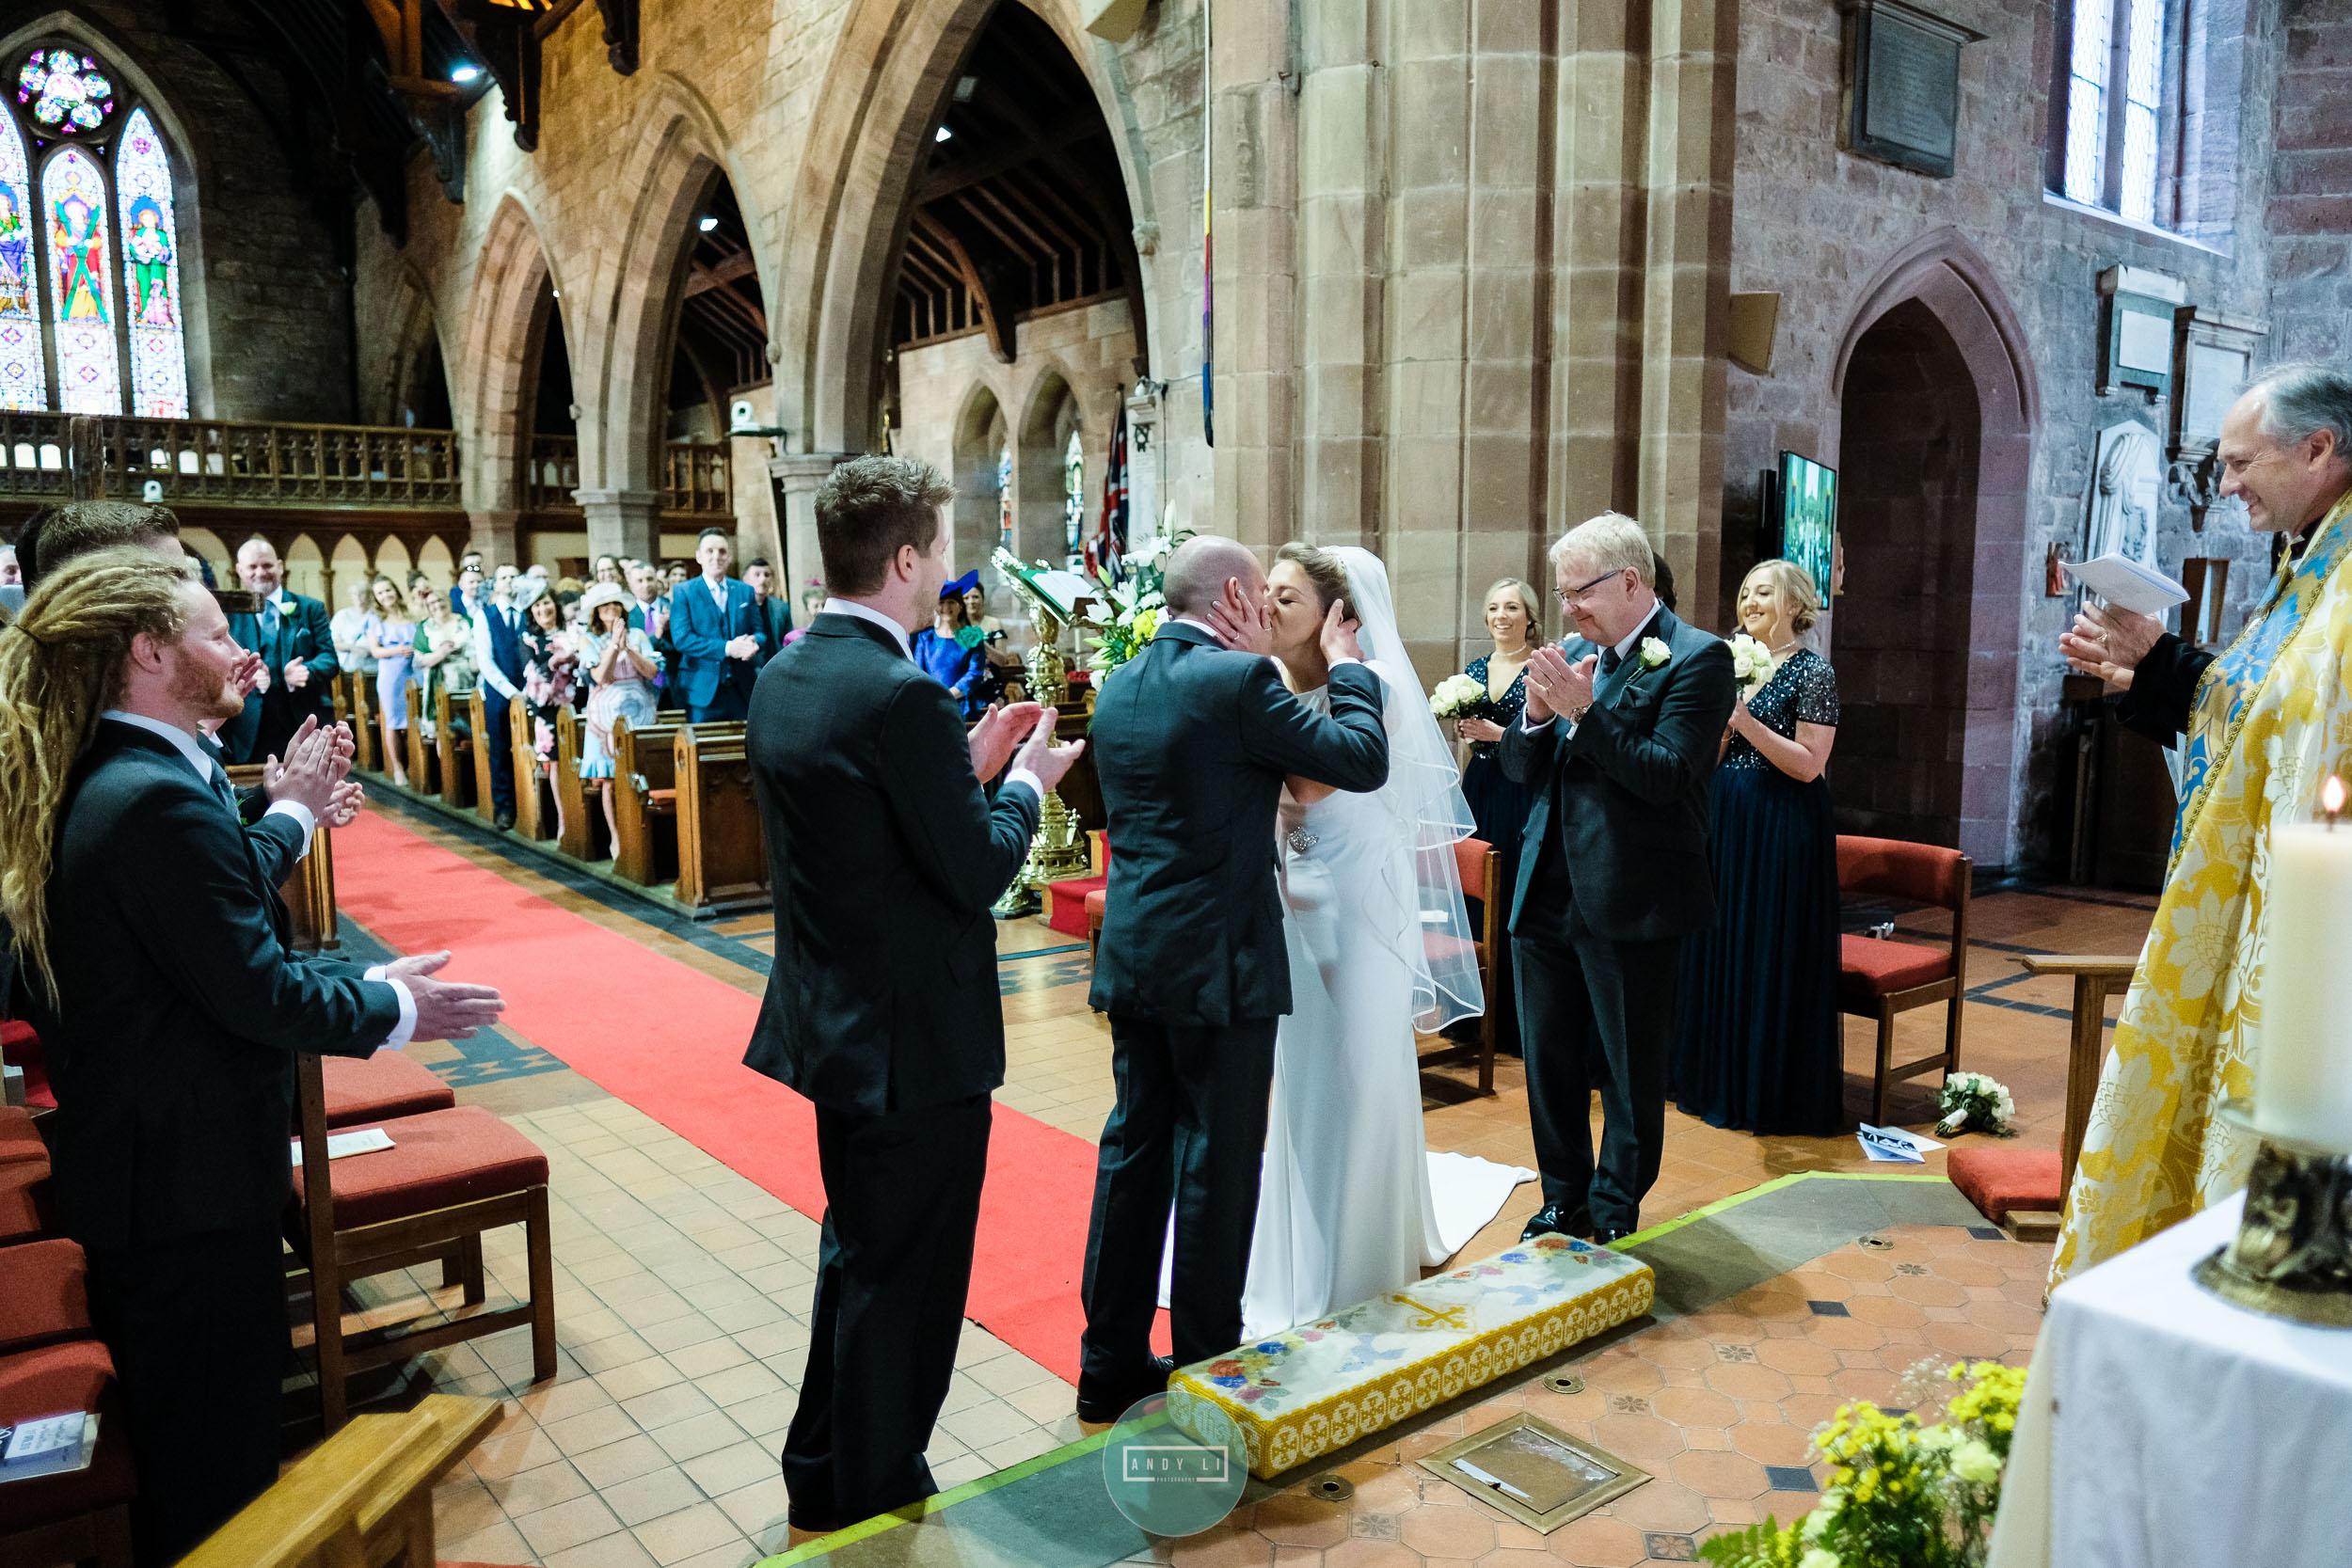 Lilleshall Hall Wedding Photographer-031-XPRO0709.jpg